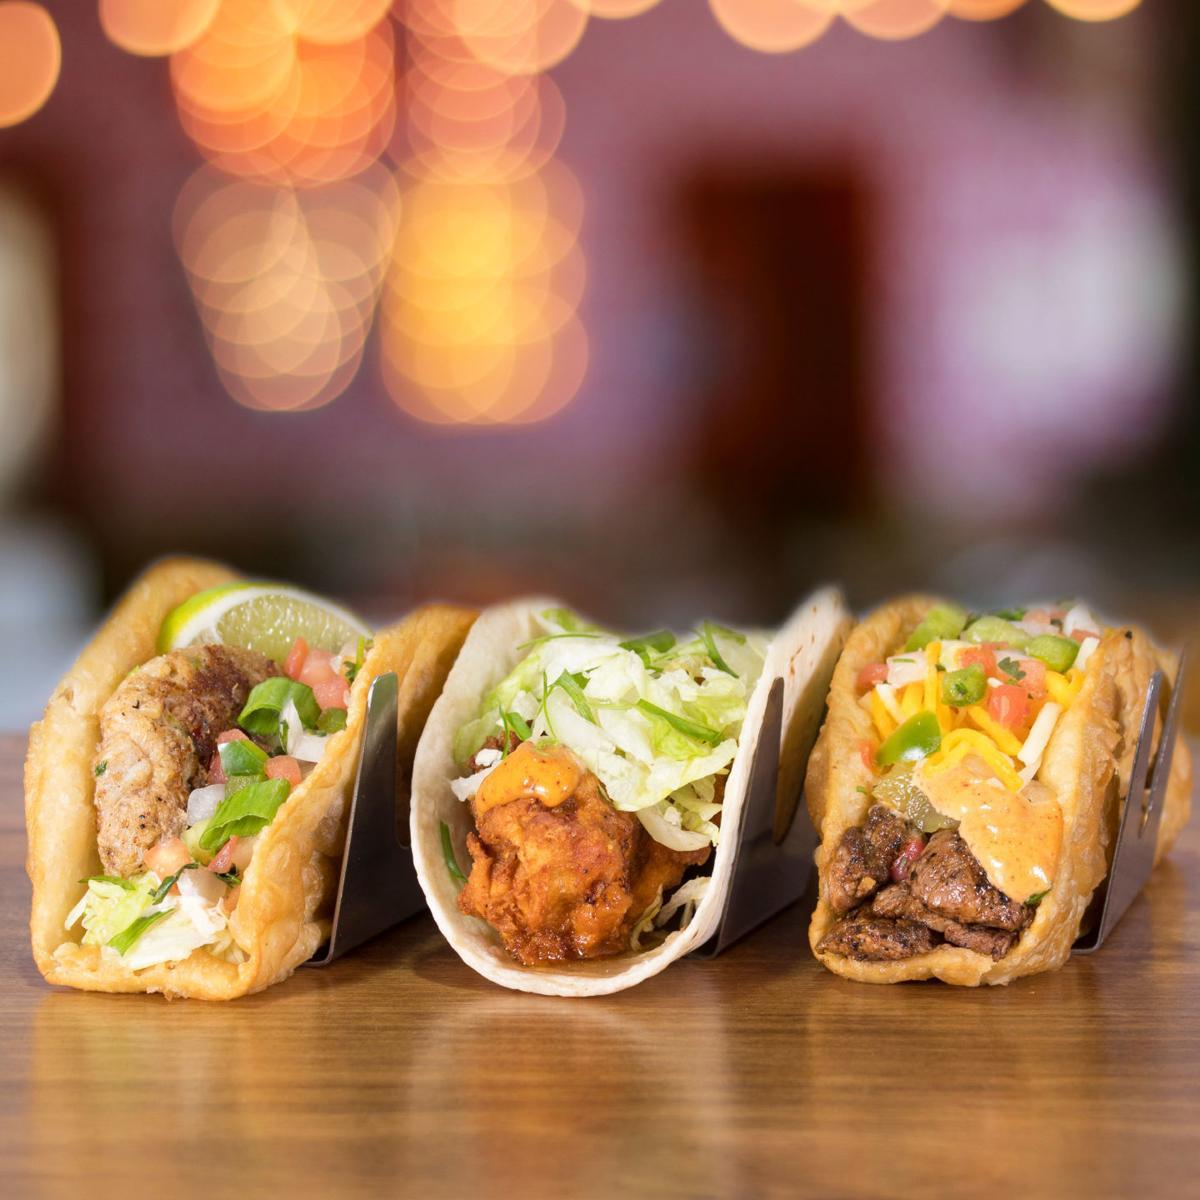 Tacos 4 Life tacos